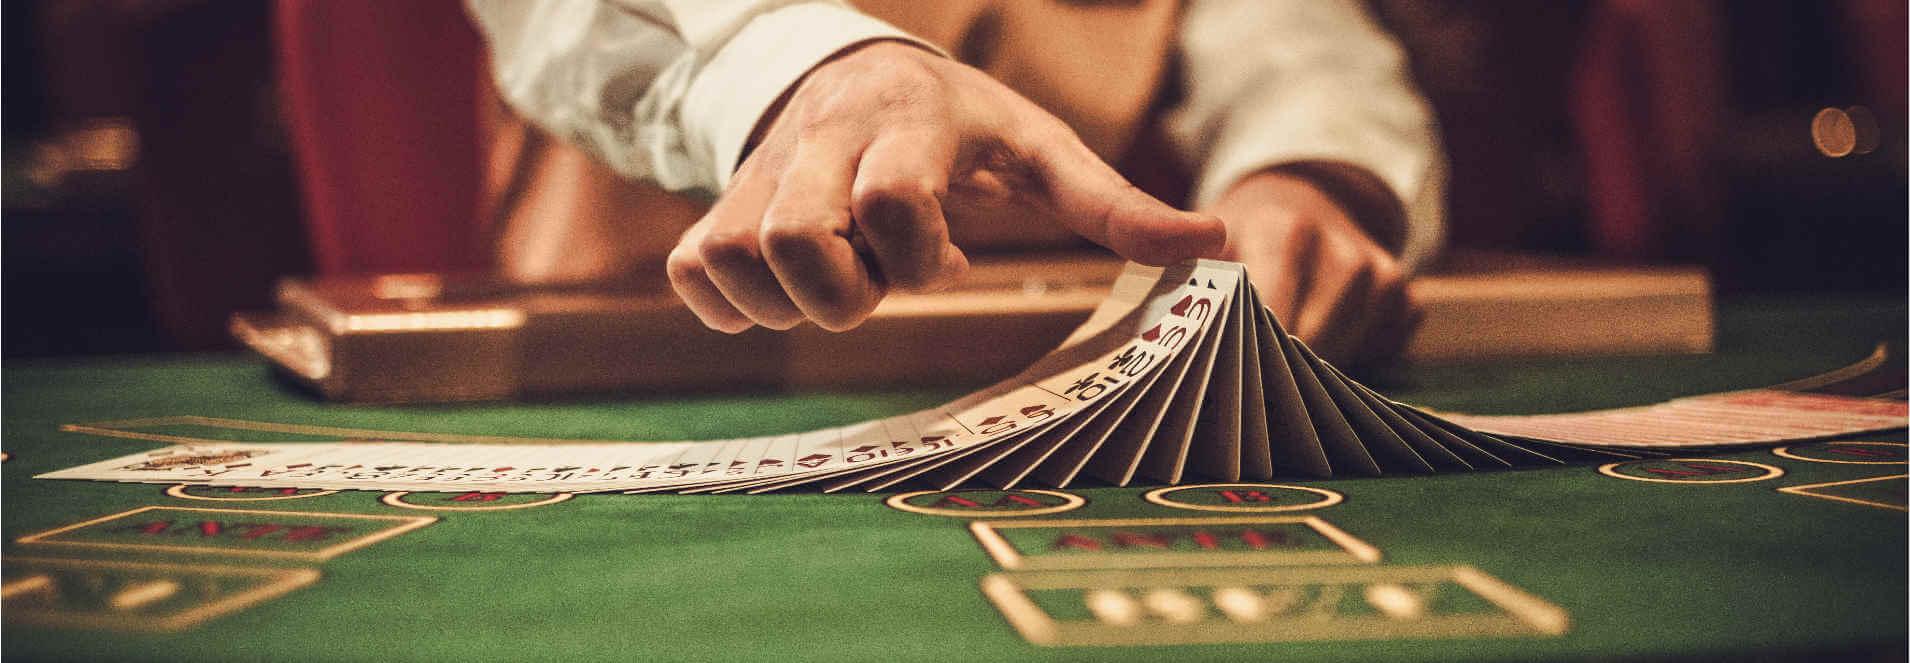 blackjack kaarten rits